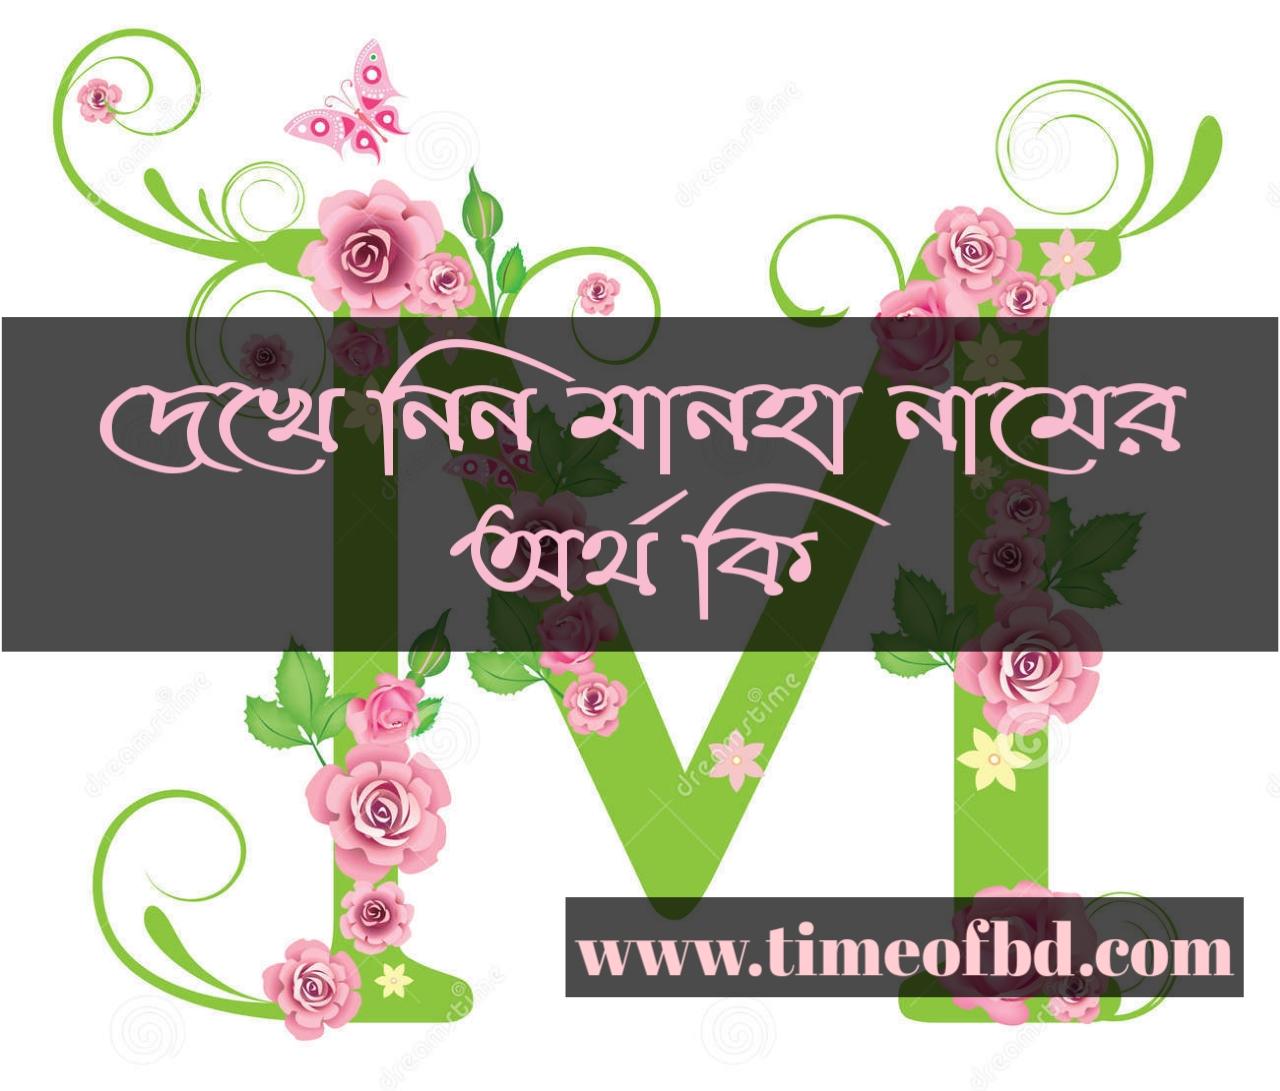 Manha name meaning in Bengali, মানহা নামের অর্থ কি, মানহা নামের বাংলা অর্থ কি, মানহা নামের ইসলামিক অর্থ কি,